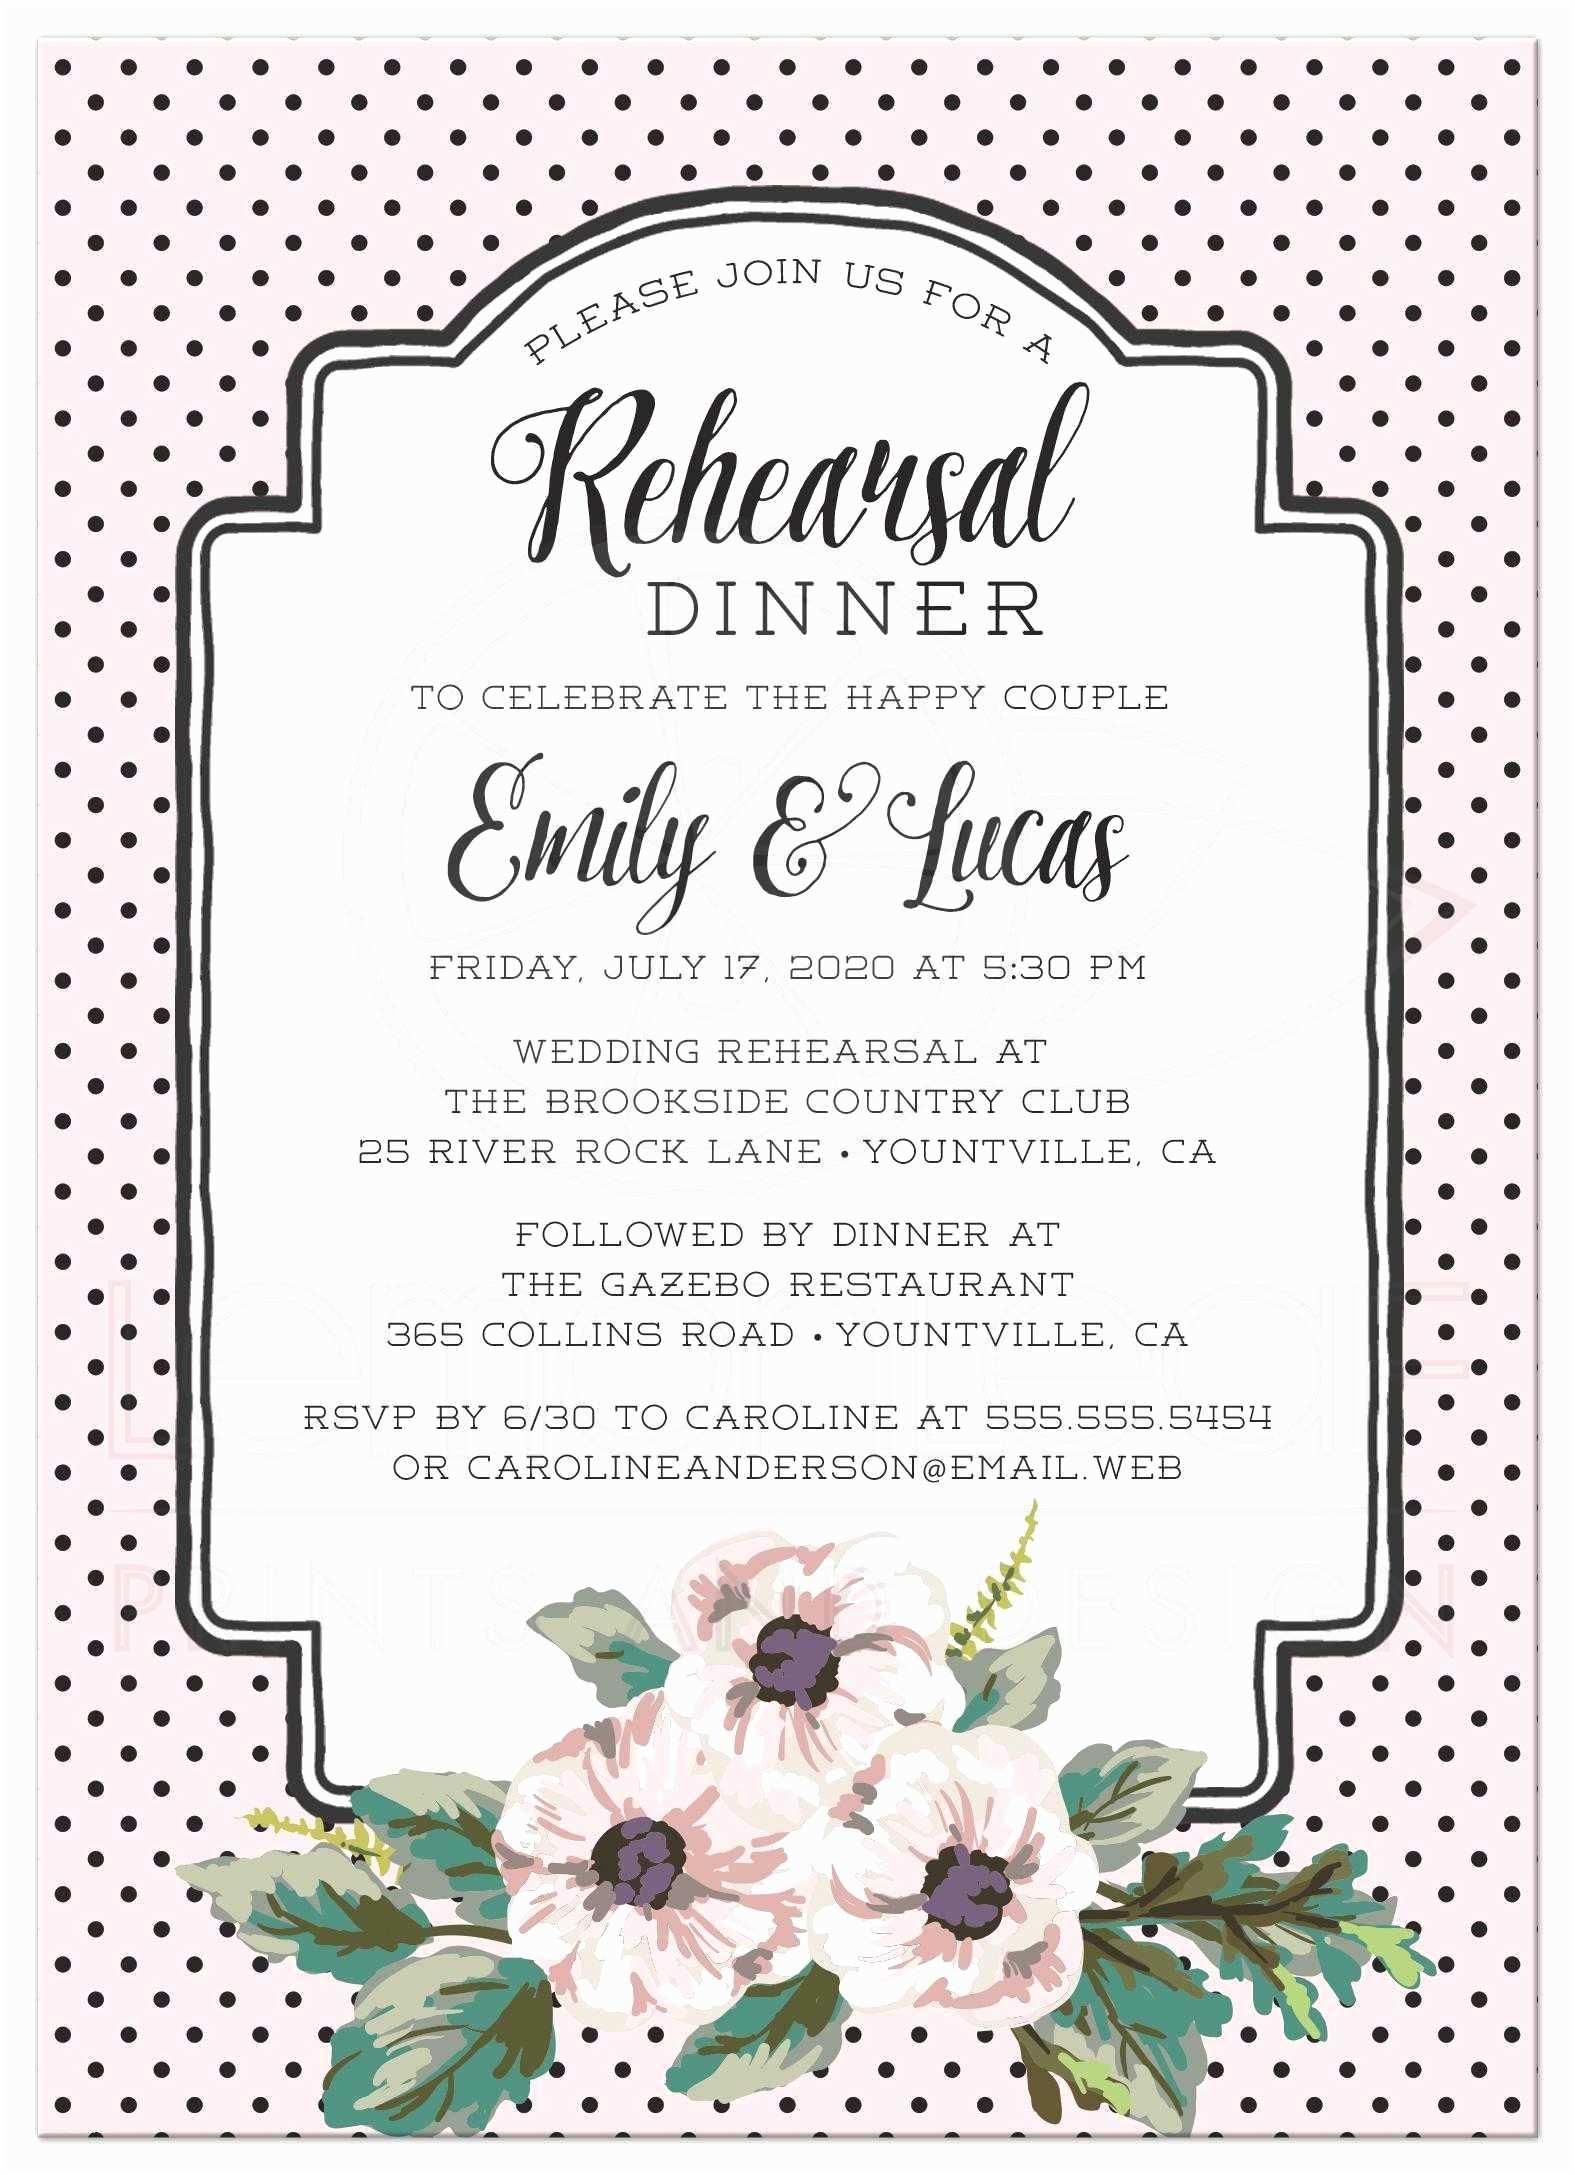 Wedding Rehearsal Invitations Wedding Rehearsal Dinner Invitations Retro Polka Dots